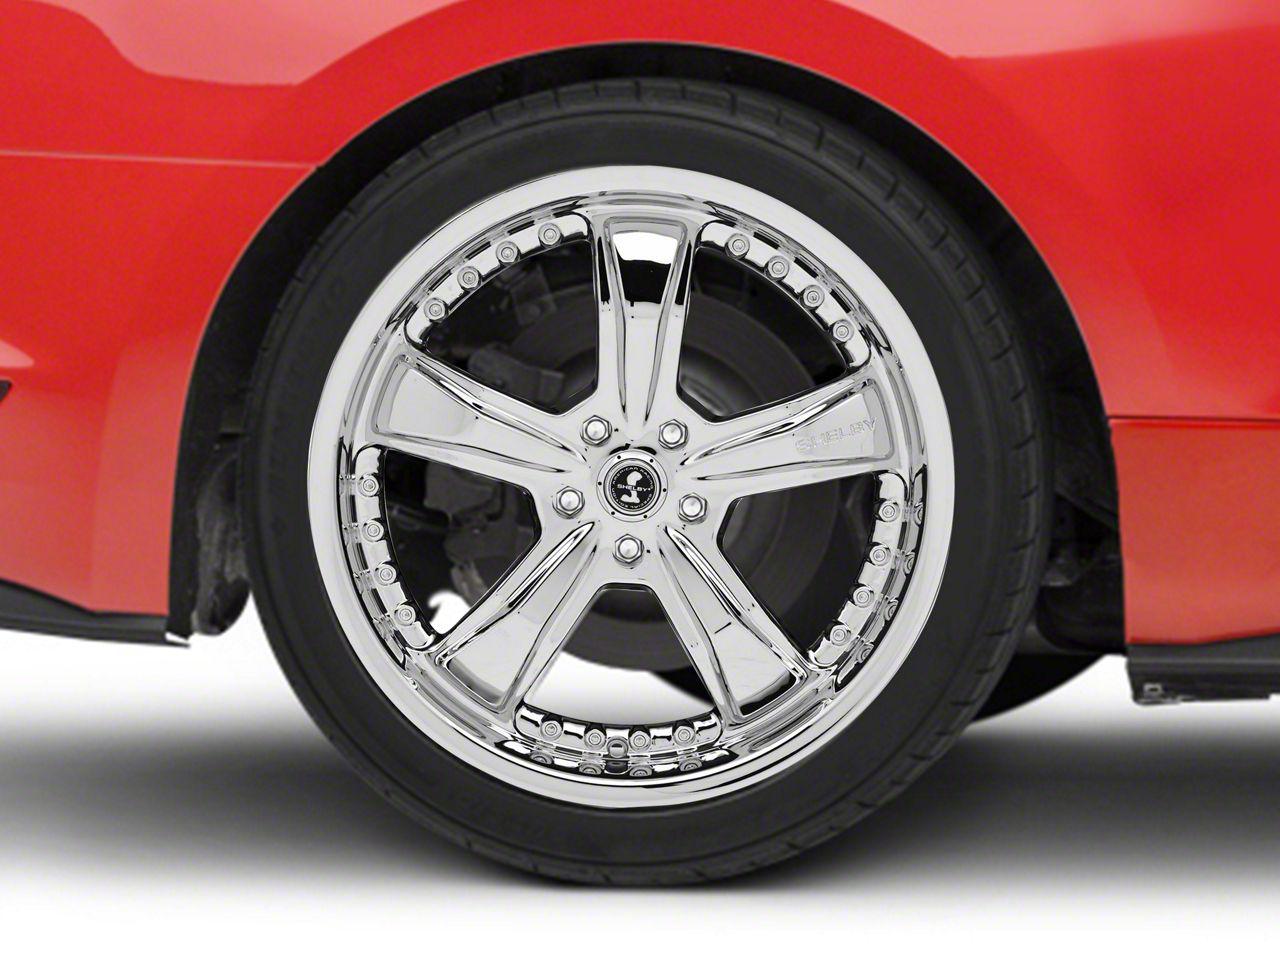 Shelby Razor Chrome Wheel - 20x10 - Rear Only (15-19 GT, EcoBoost, V6)